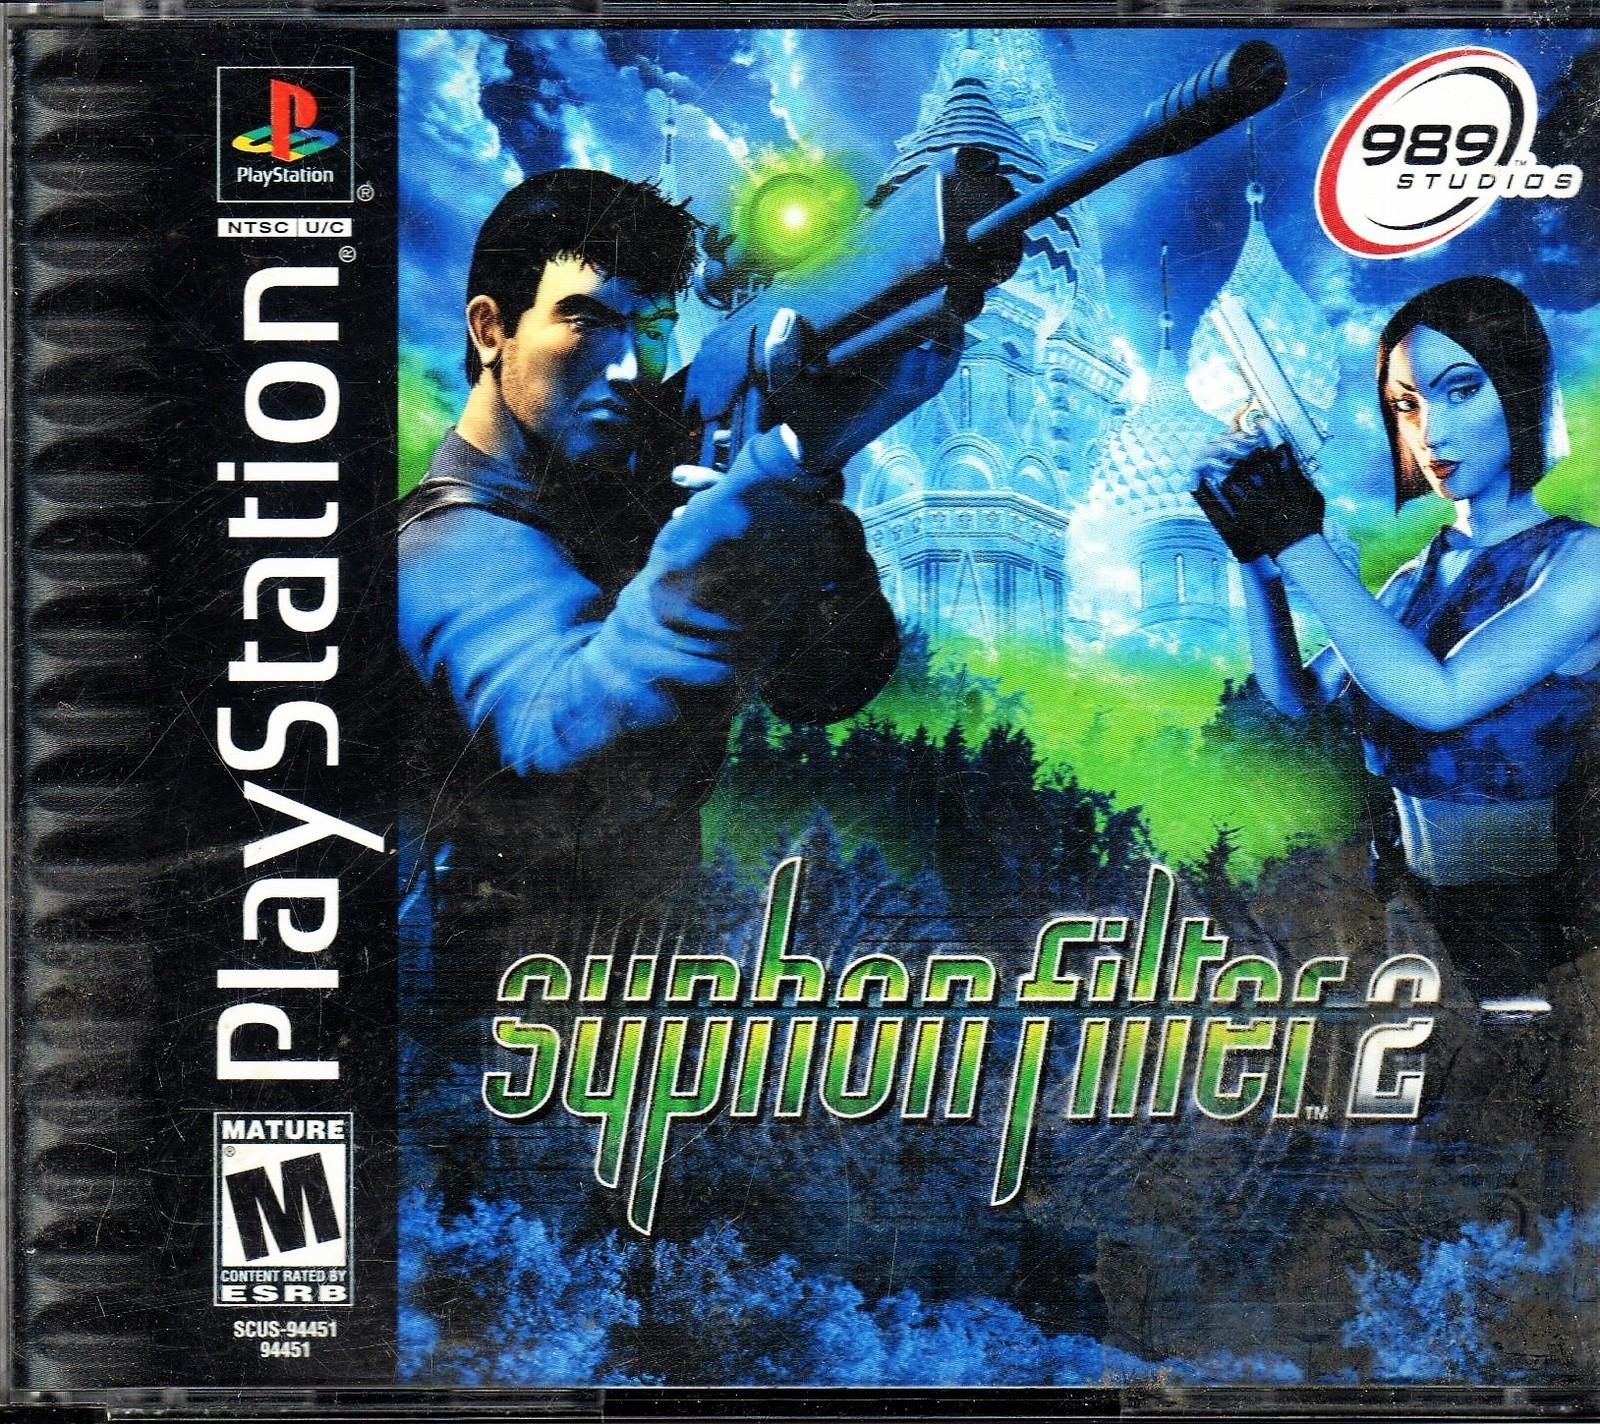 Playstation - Syphon Filter 2